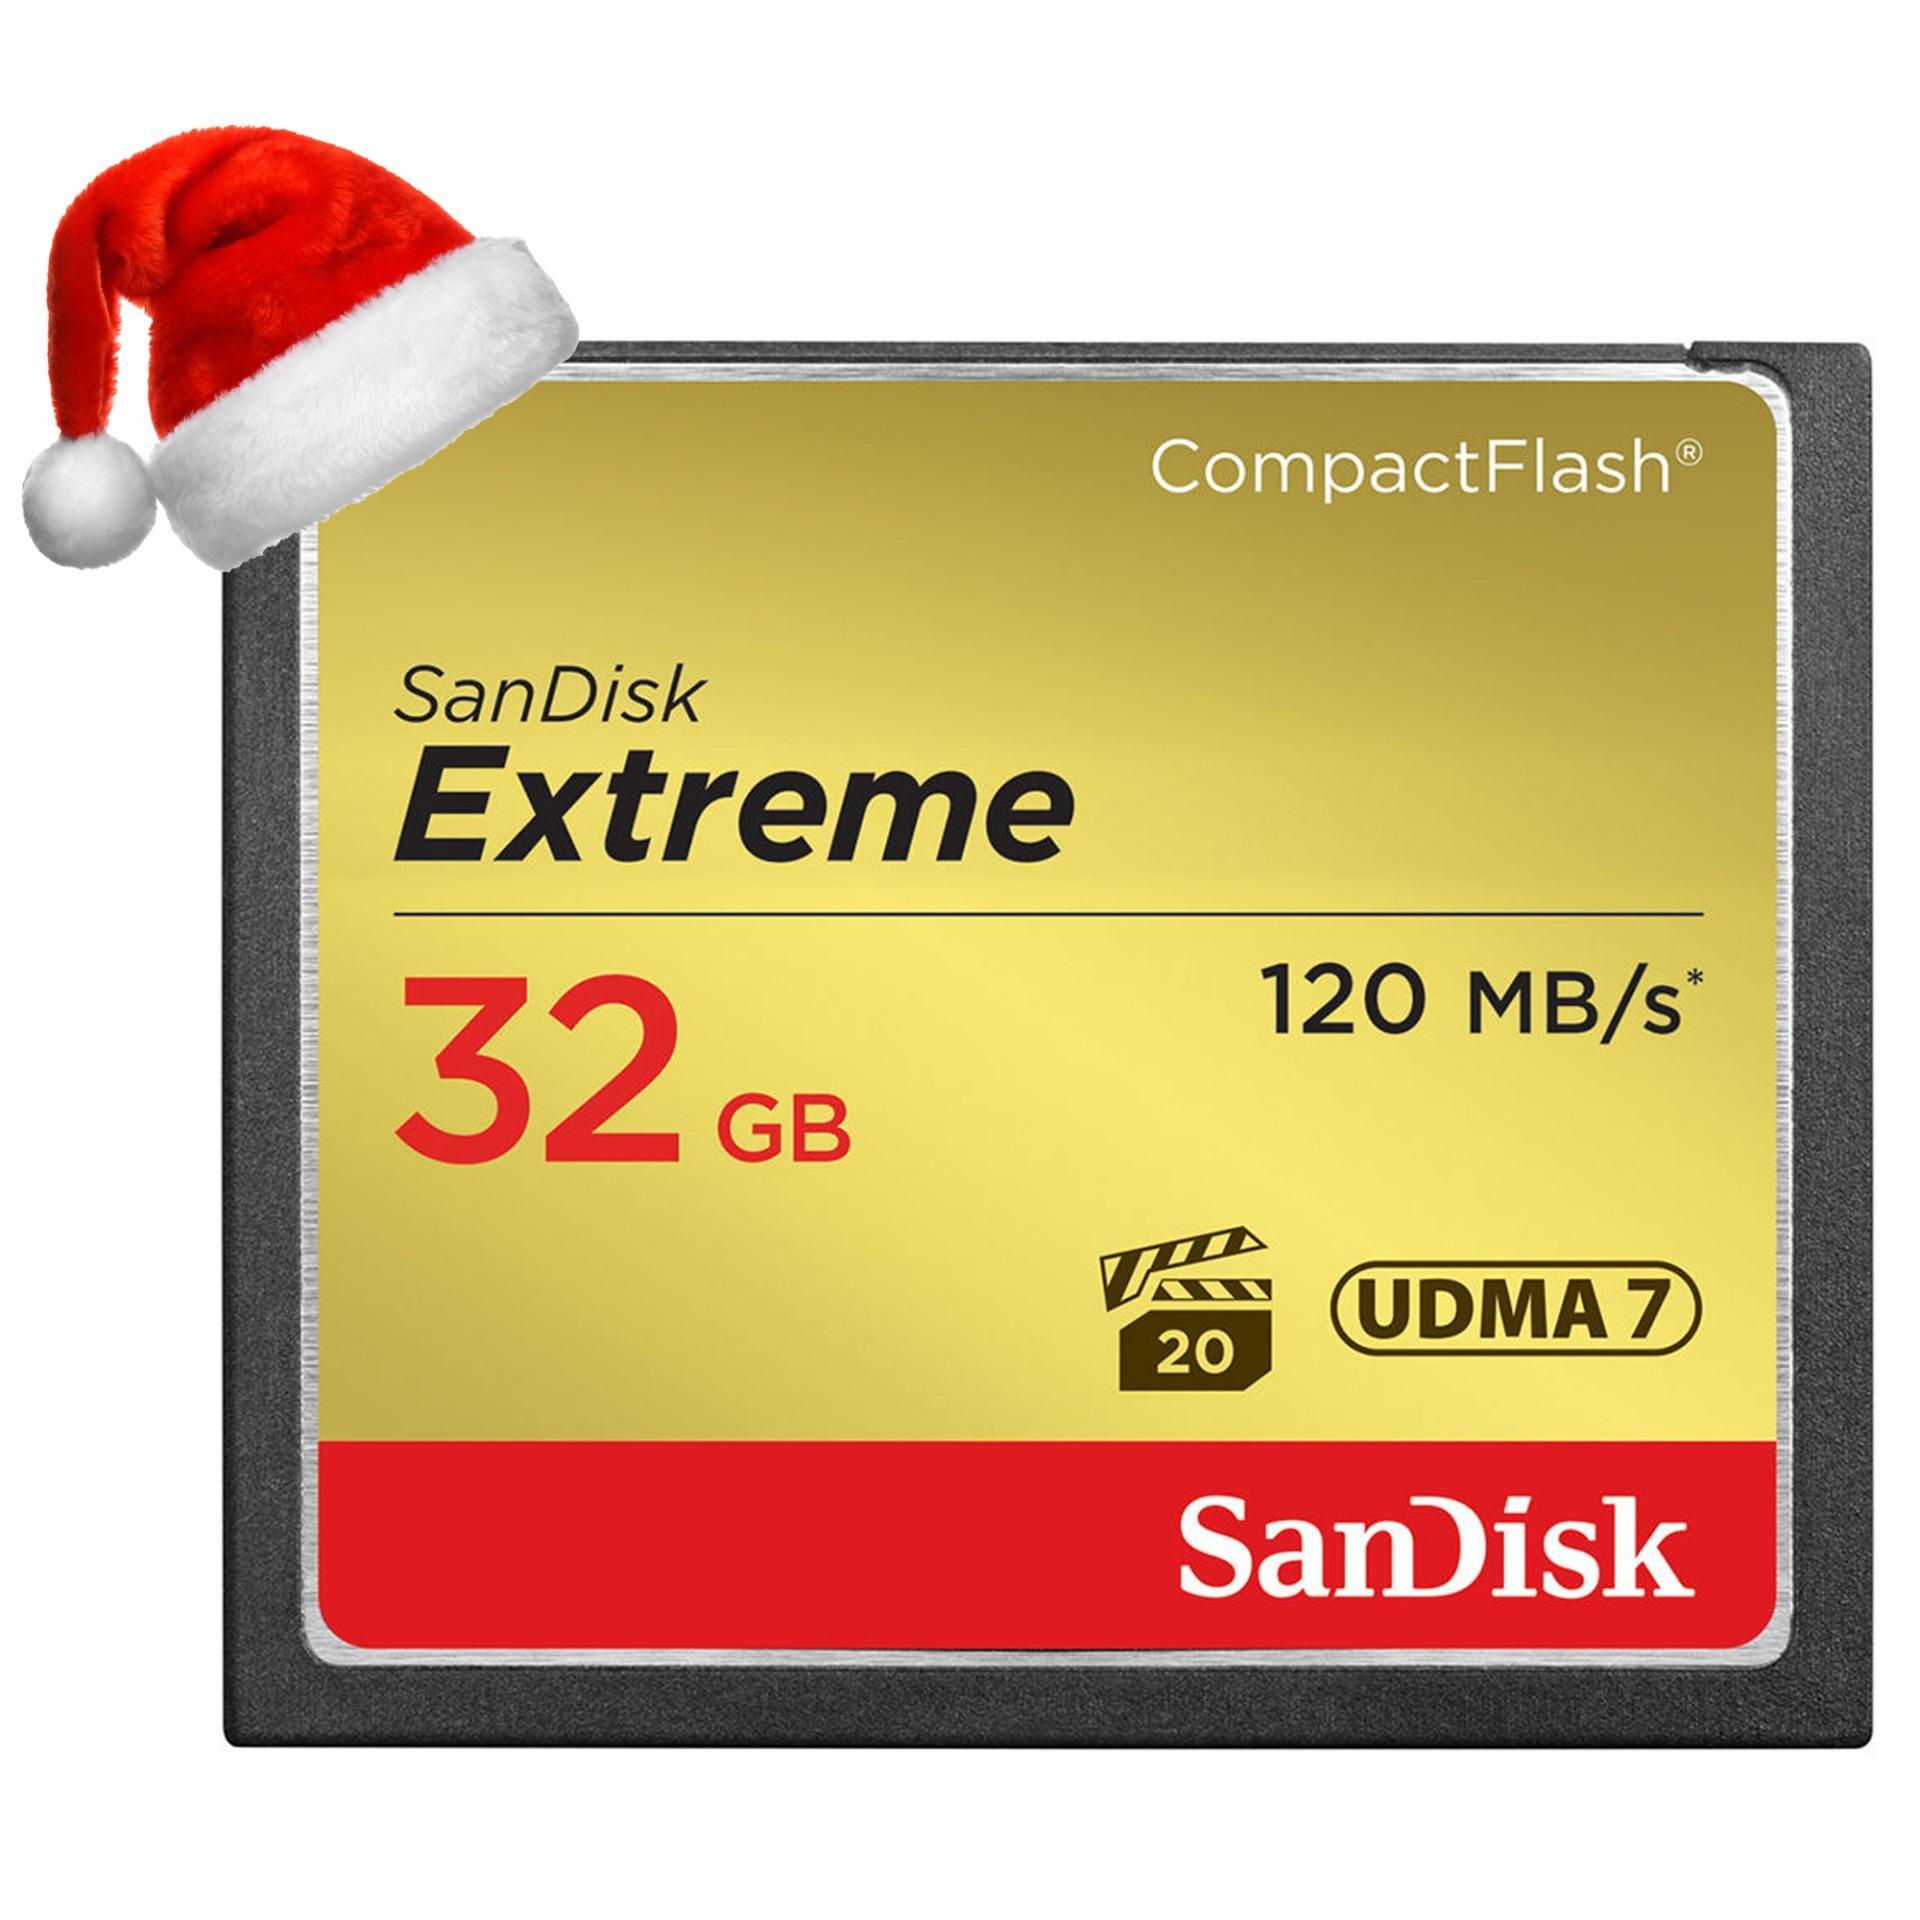 Sandisk Philippines Price List Flash Drive Flashdisk Cruzer Edge Cz51 Compact Cards